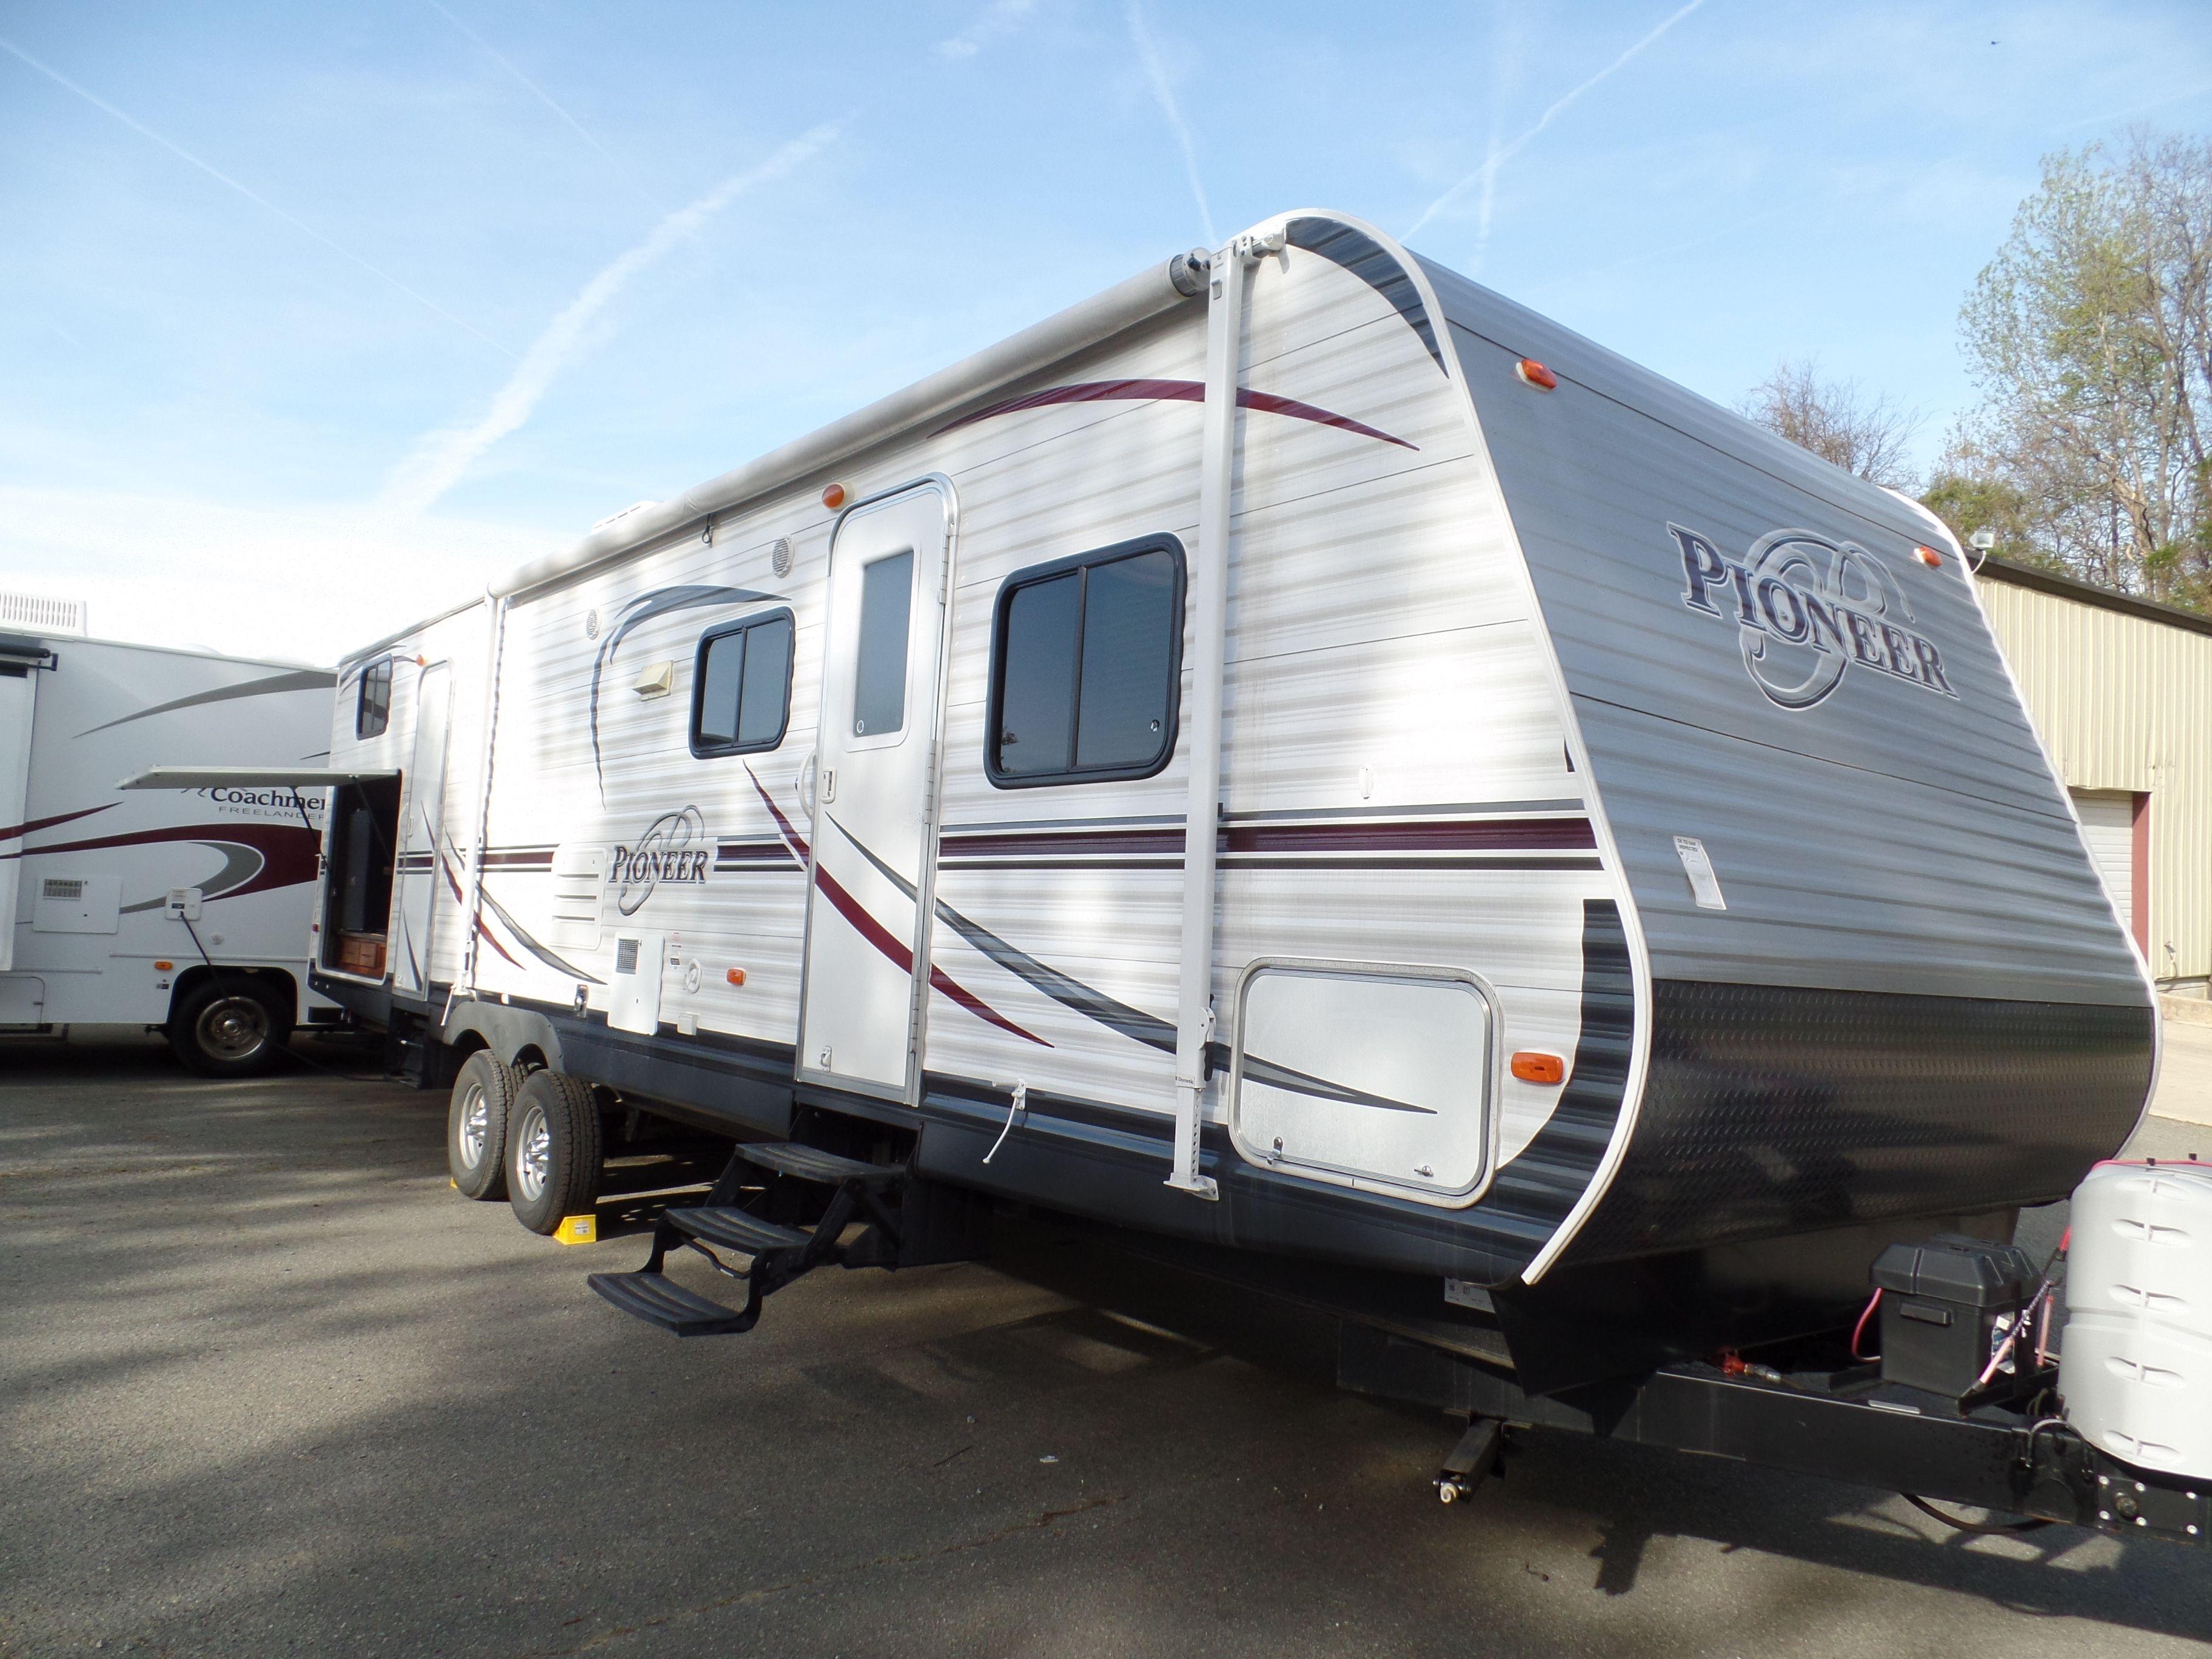 Home bunkhouse travel trailer travel trailer rental